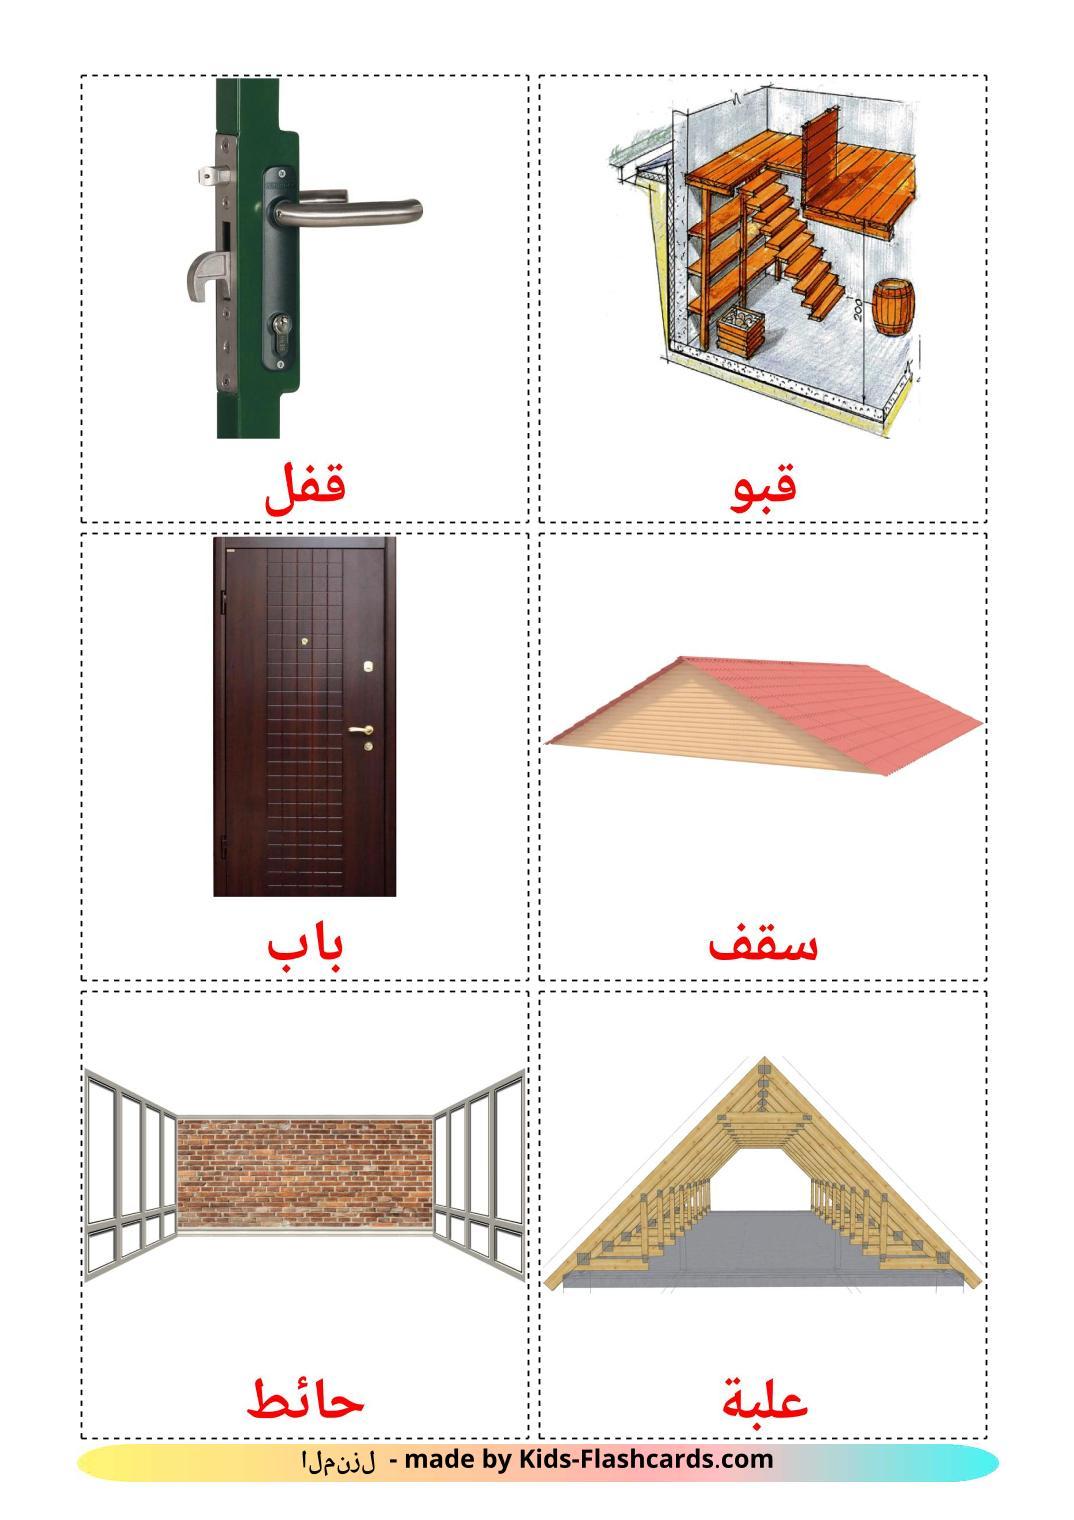 House - 25 Free Printable arabic Flashcards